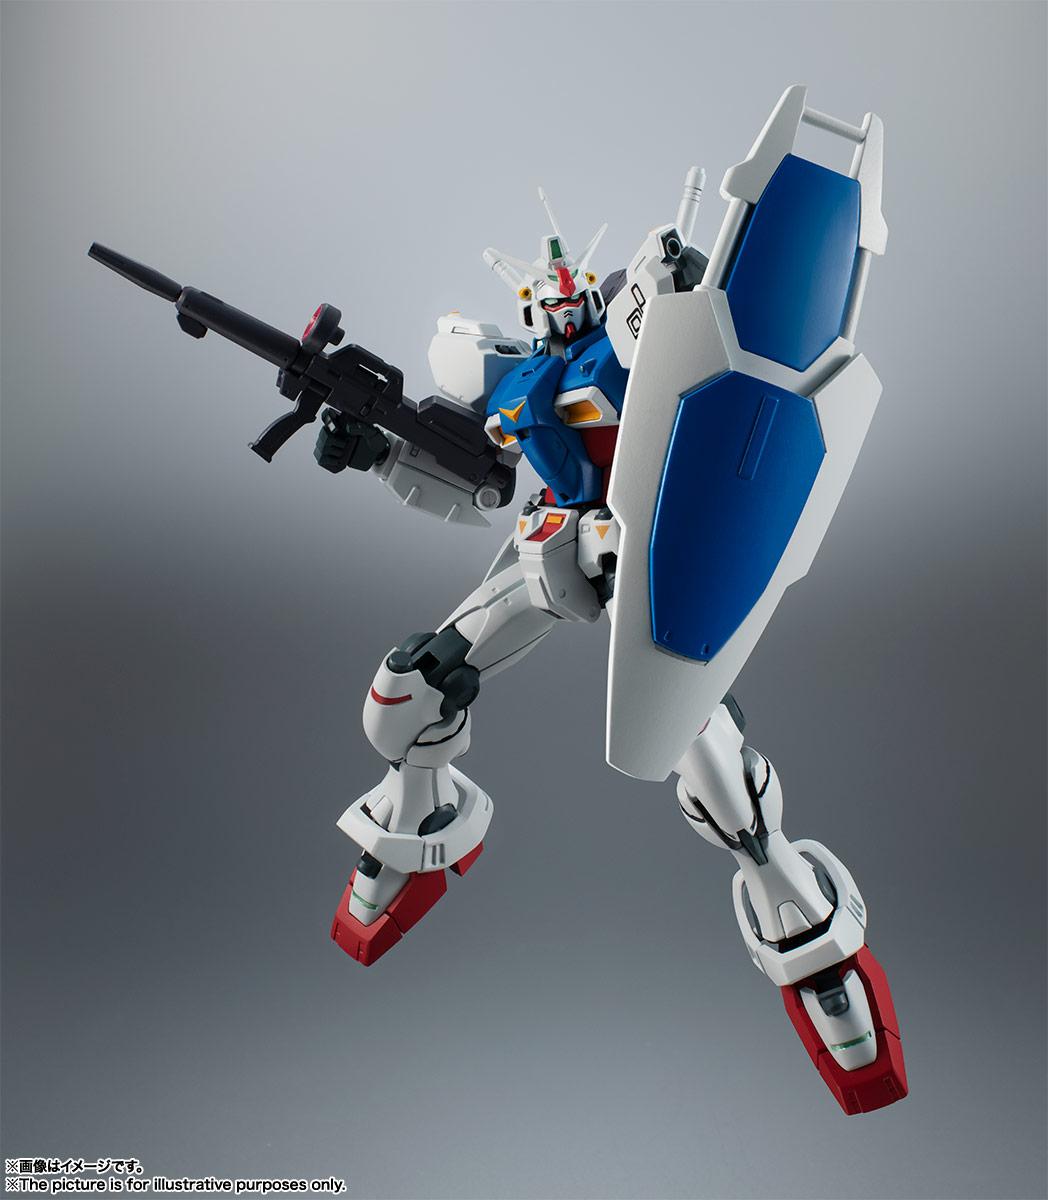 ROBOT魂〈SIDE MS〉『RX-78GP01 ガンダム試作1号機 ver. A.N.I.M.E.』可動フィギュア-009